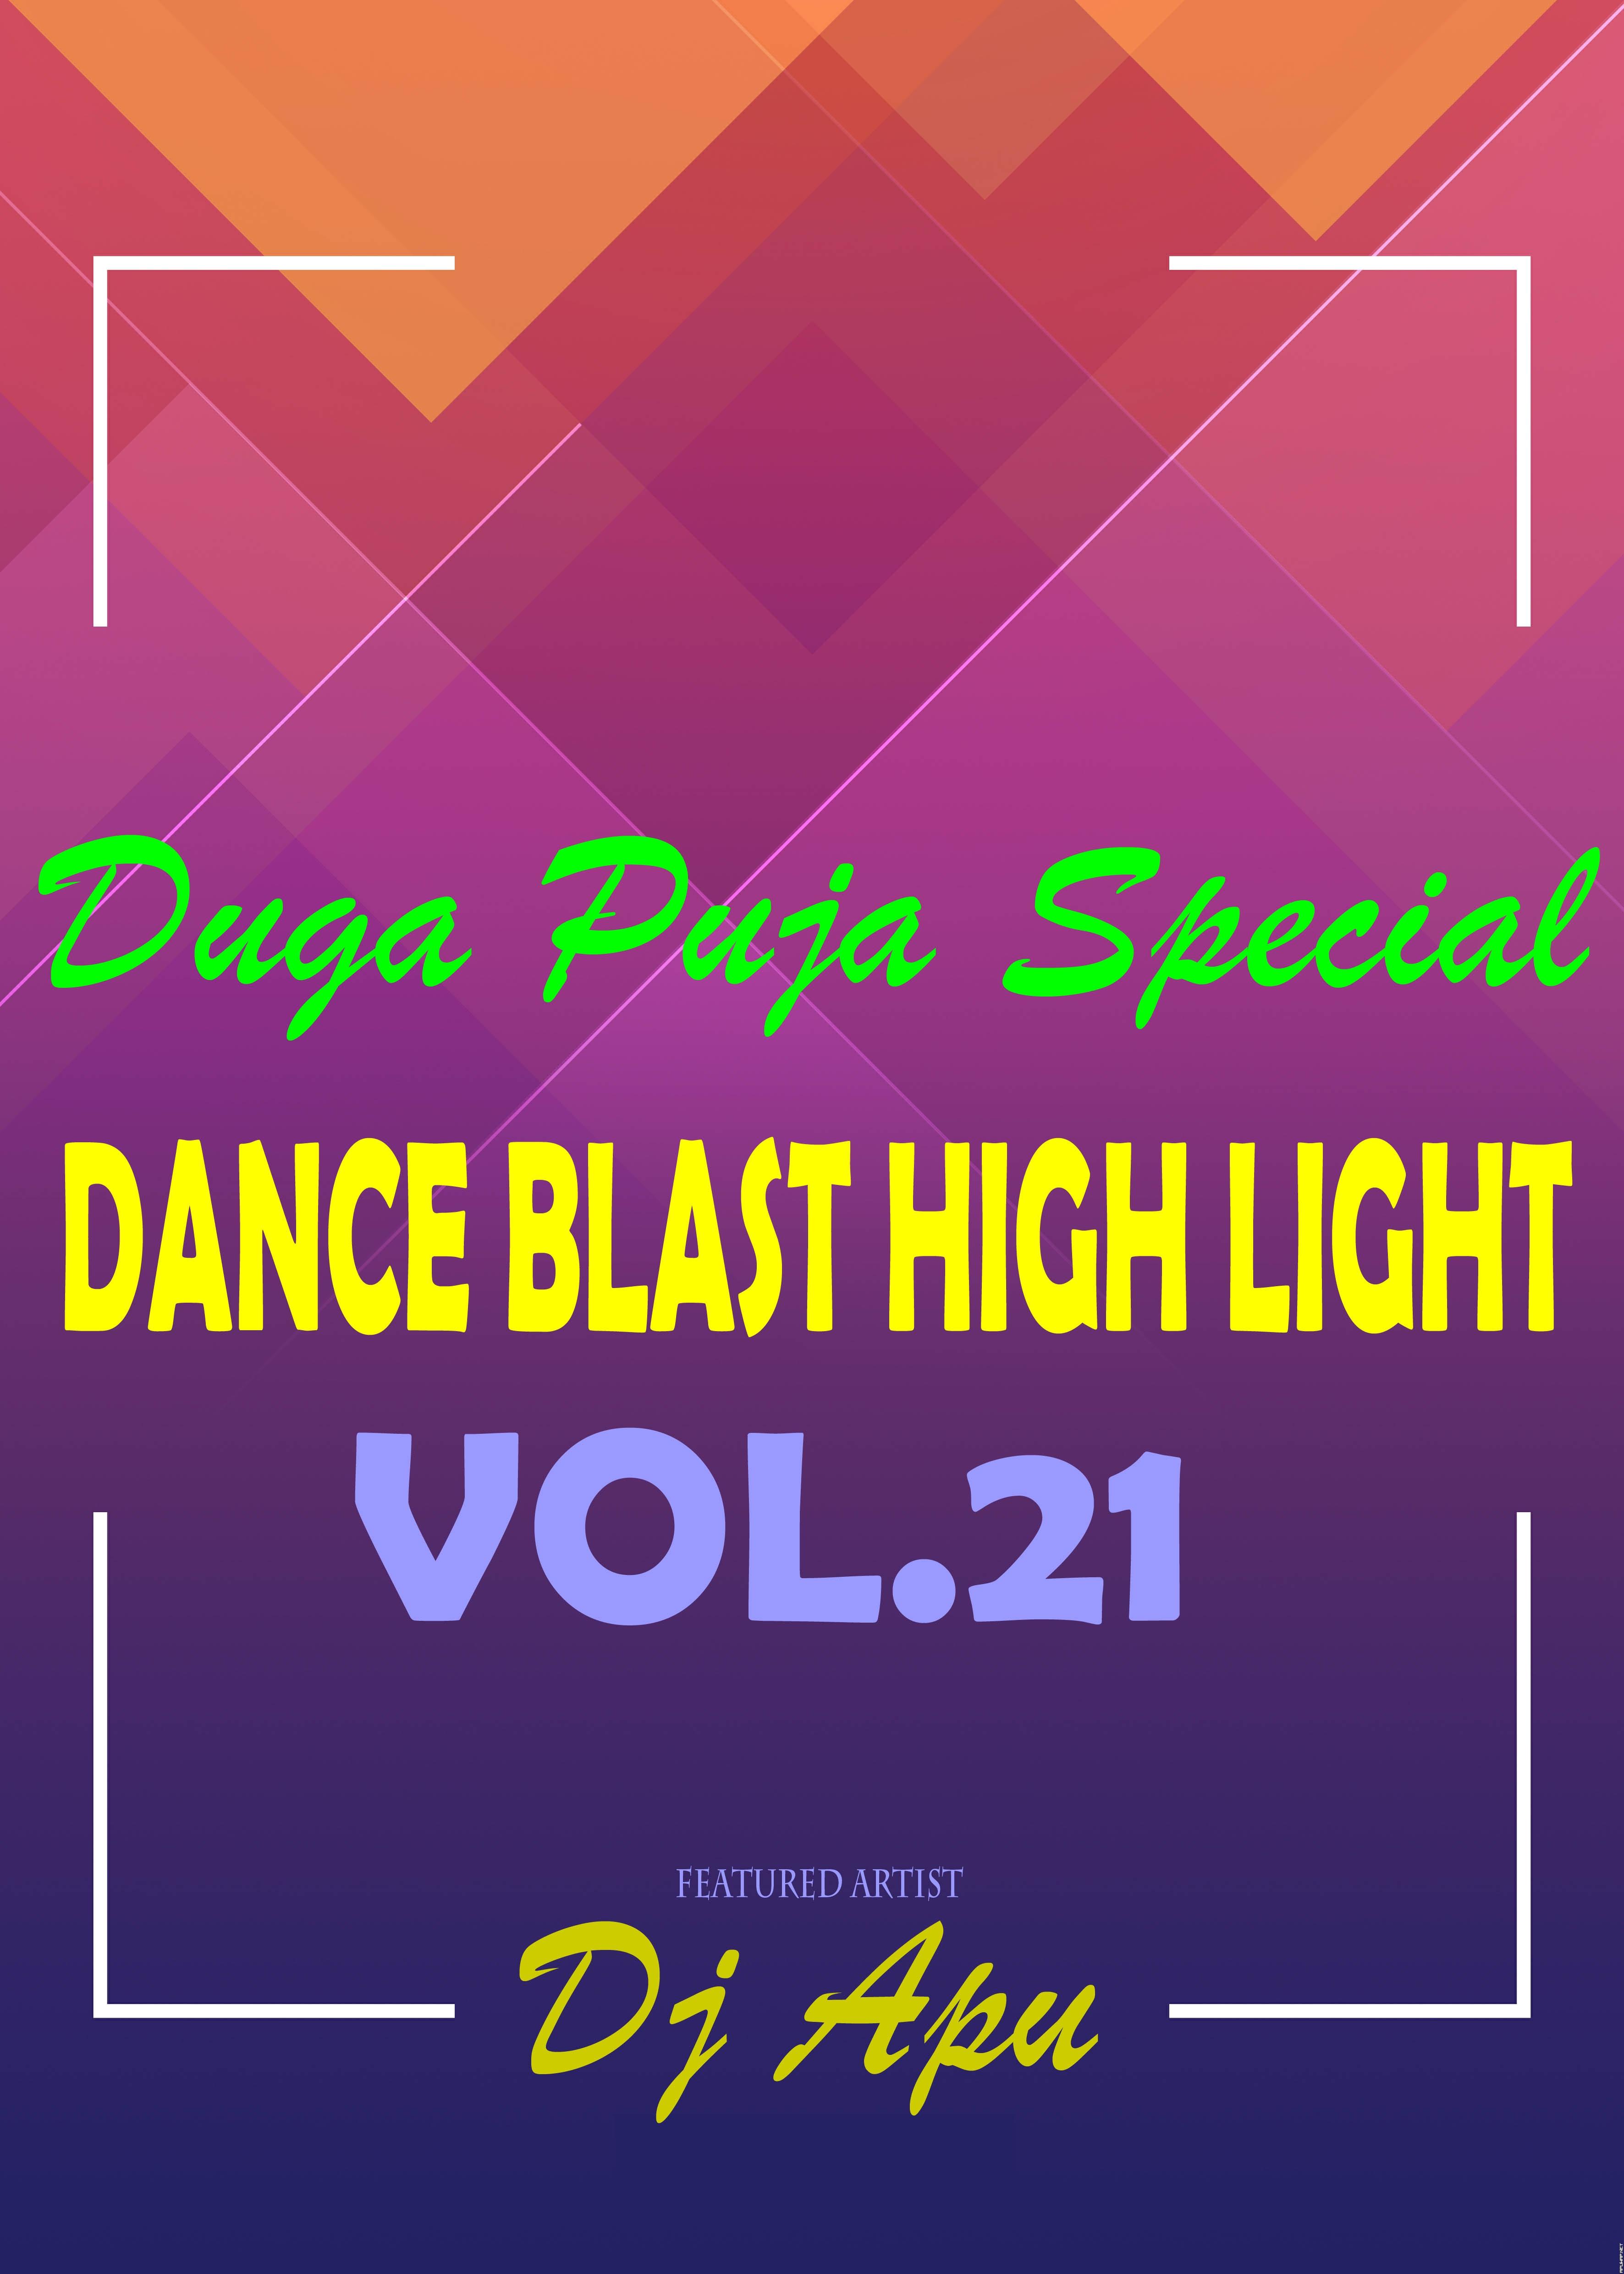 Amar Gorur Garite 2.0 (Love Mix) Dj Apu.mp3